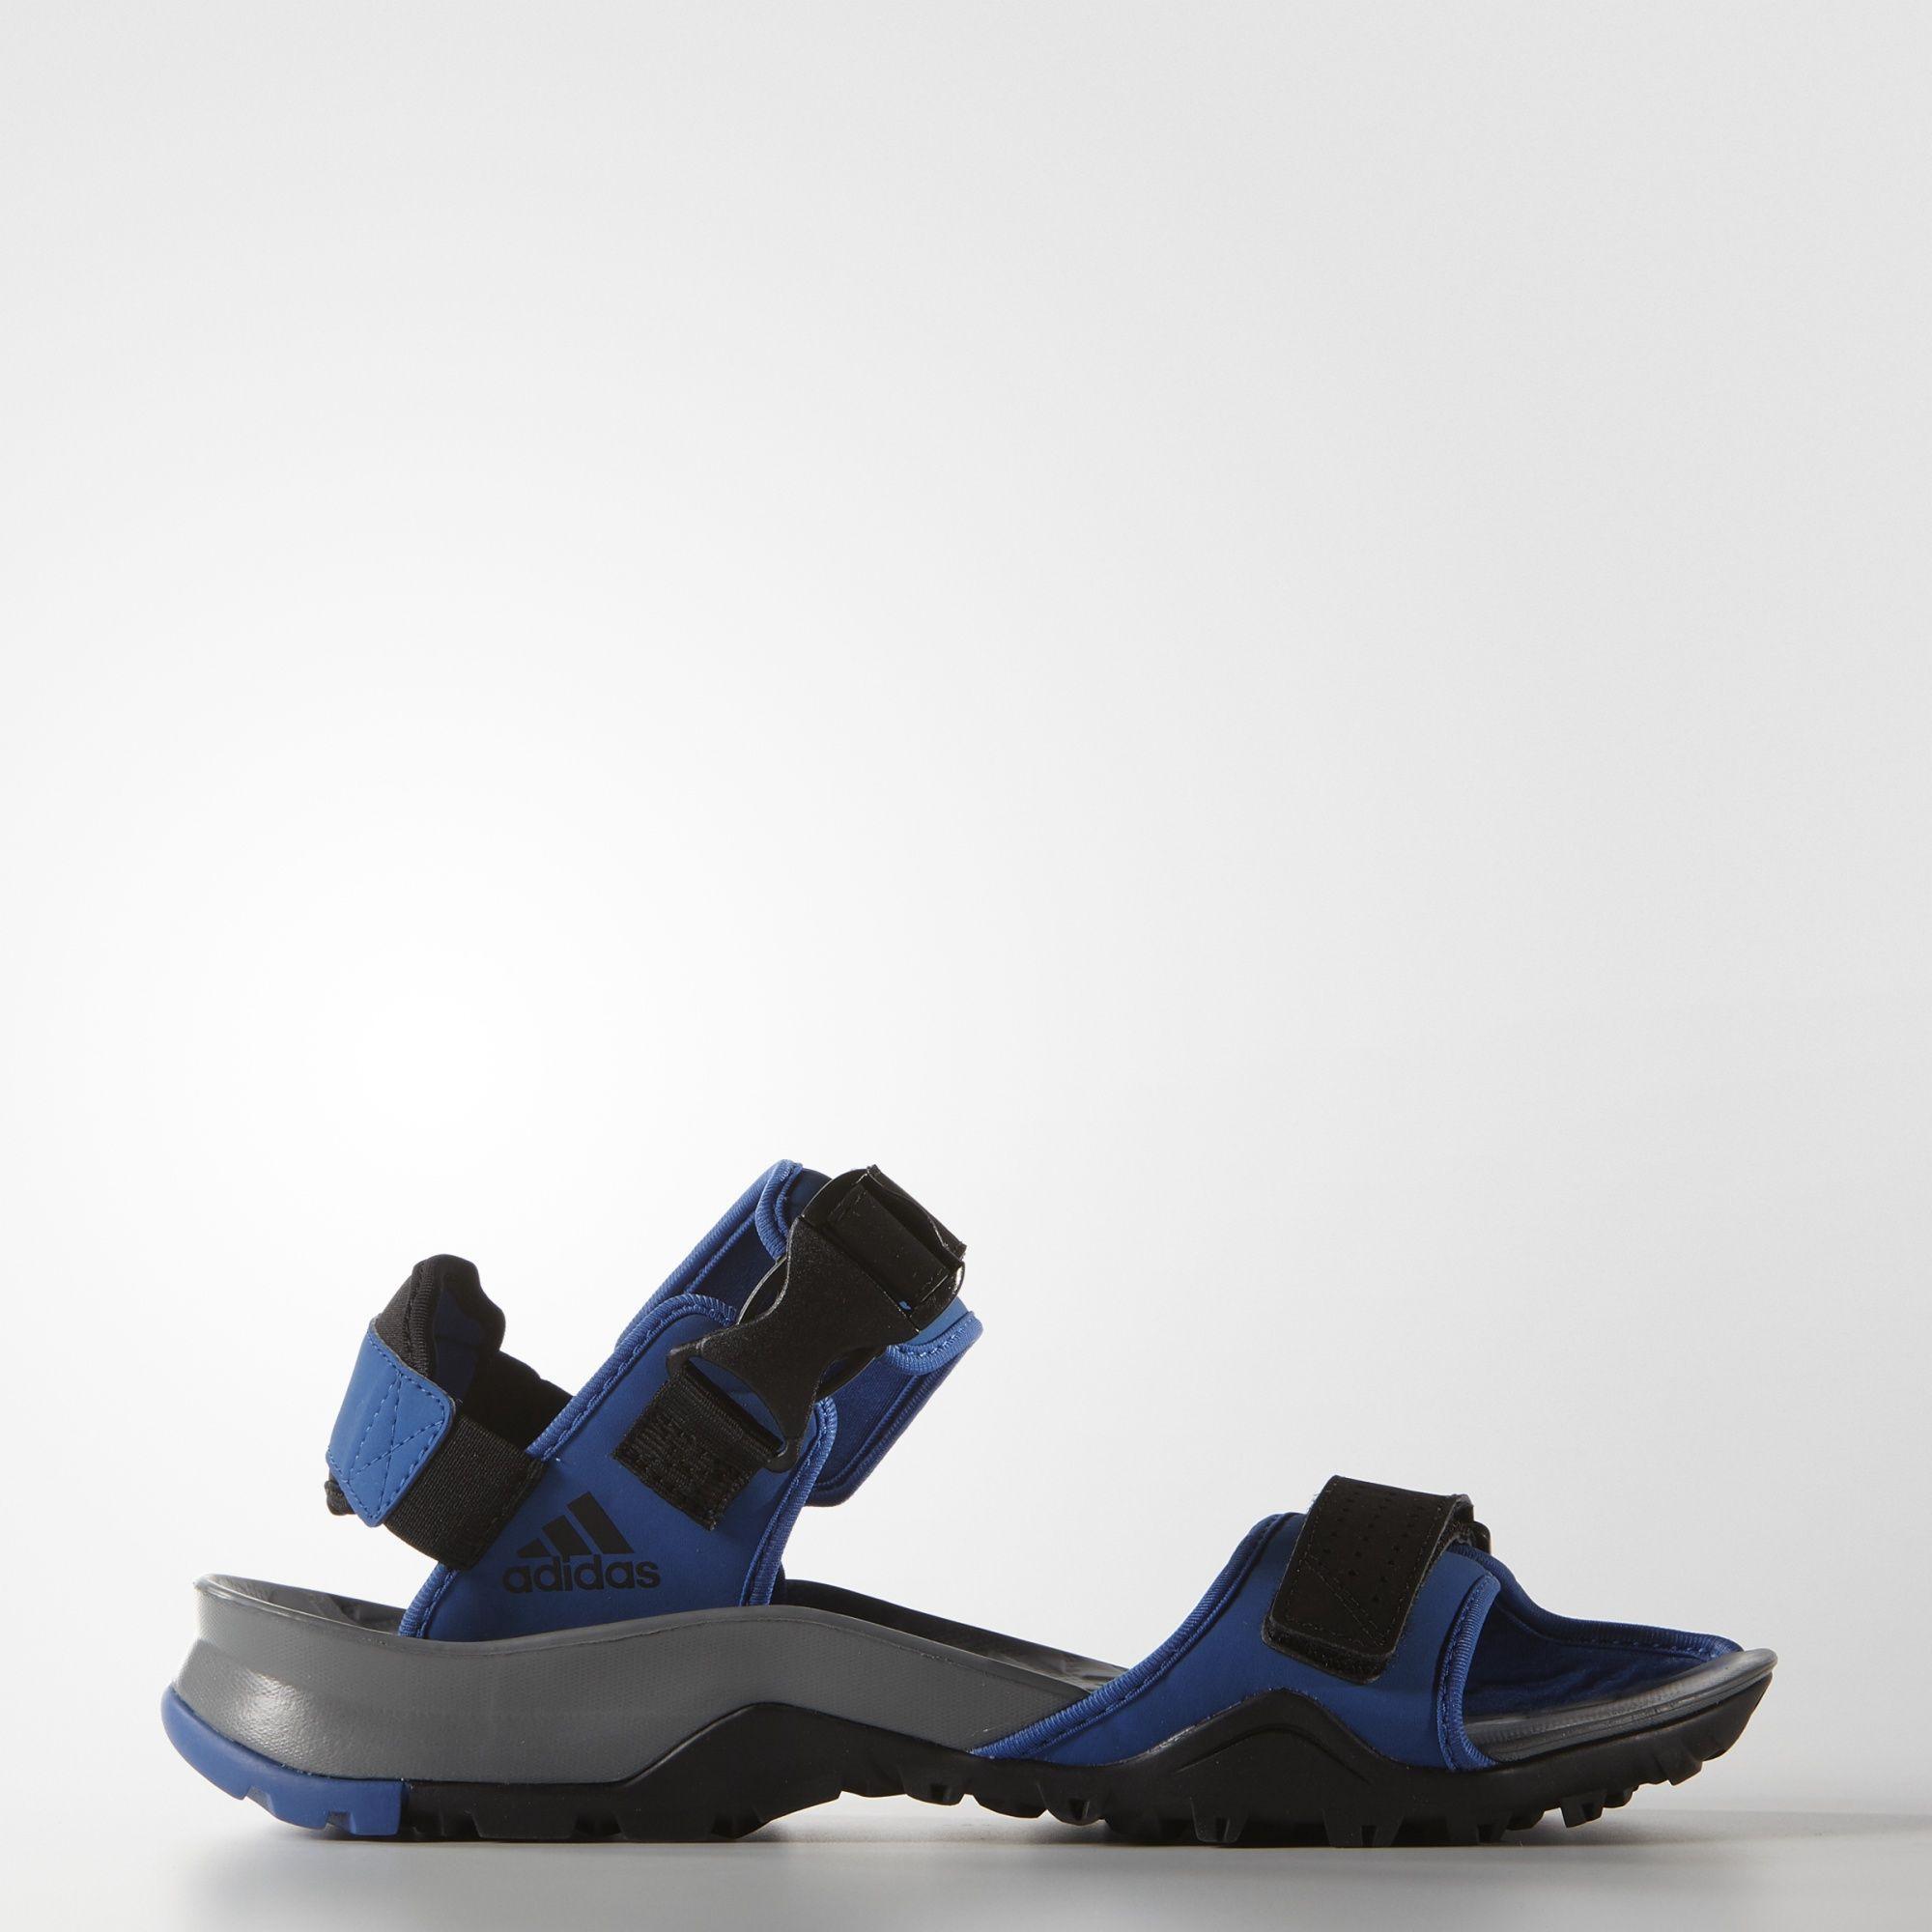 Herren Cyprex Ultra 2 Sandale